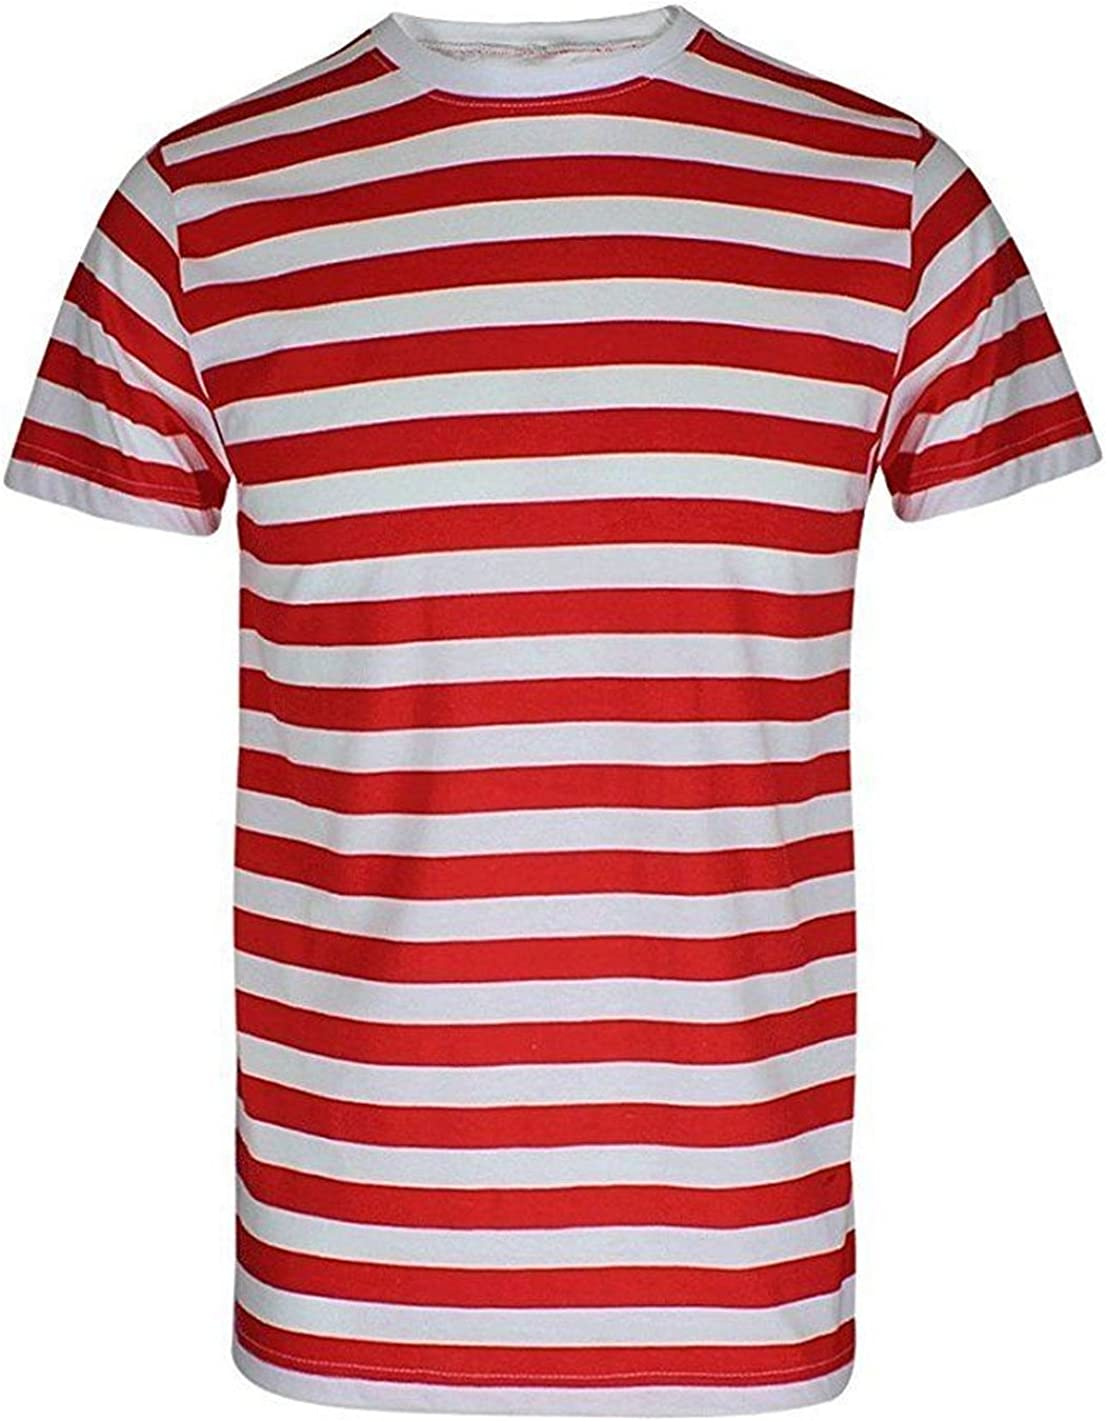 New Kids Red /& White Stripe Short Sleeve T-Shirt Children/'s Book Week Fancy Top